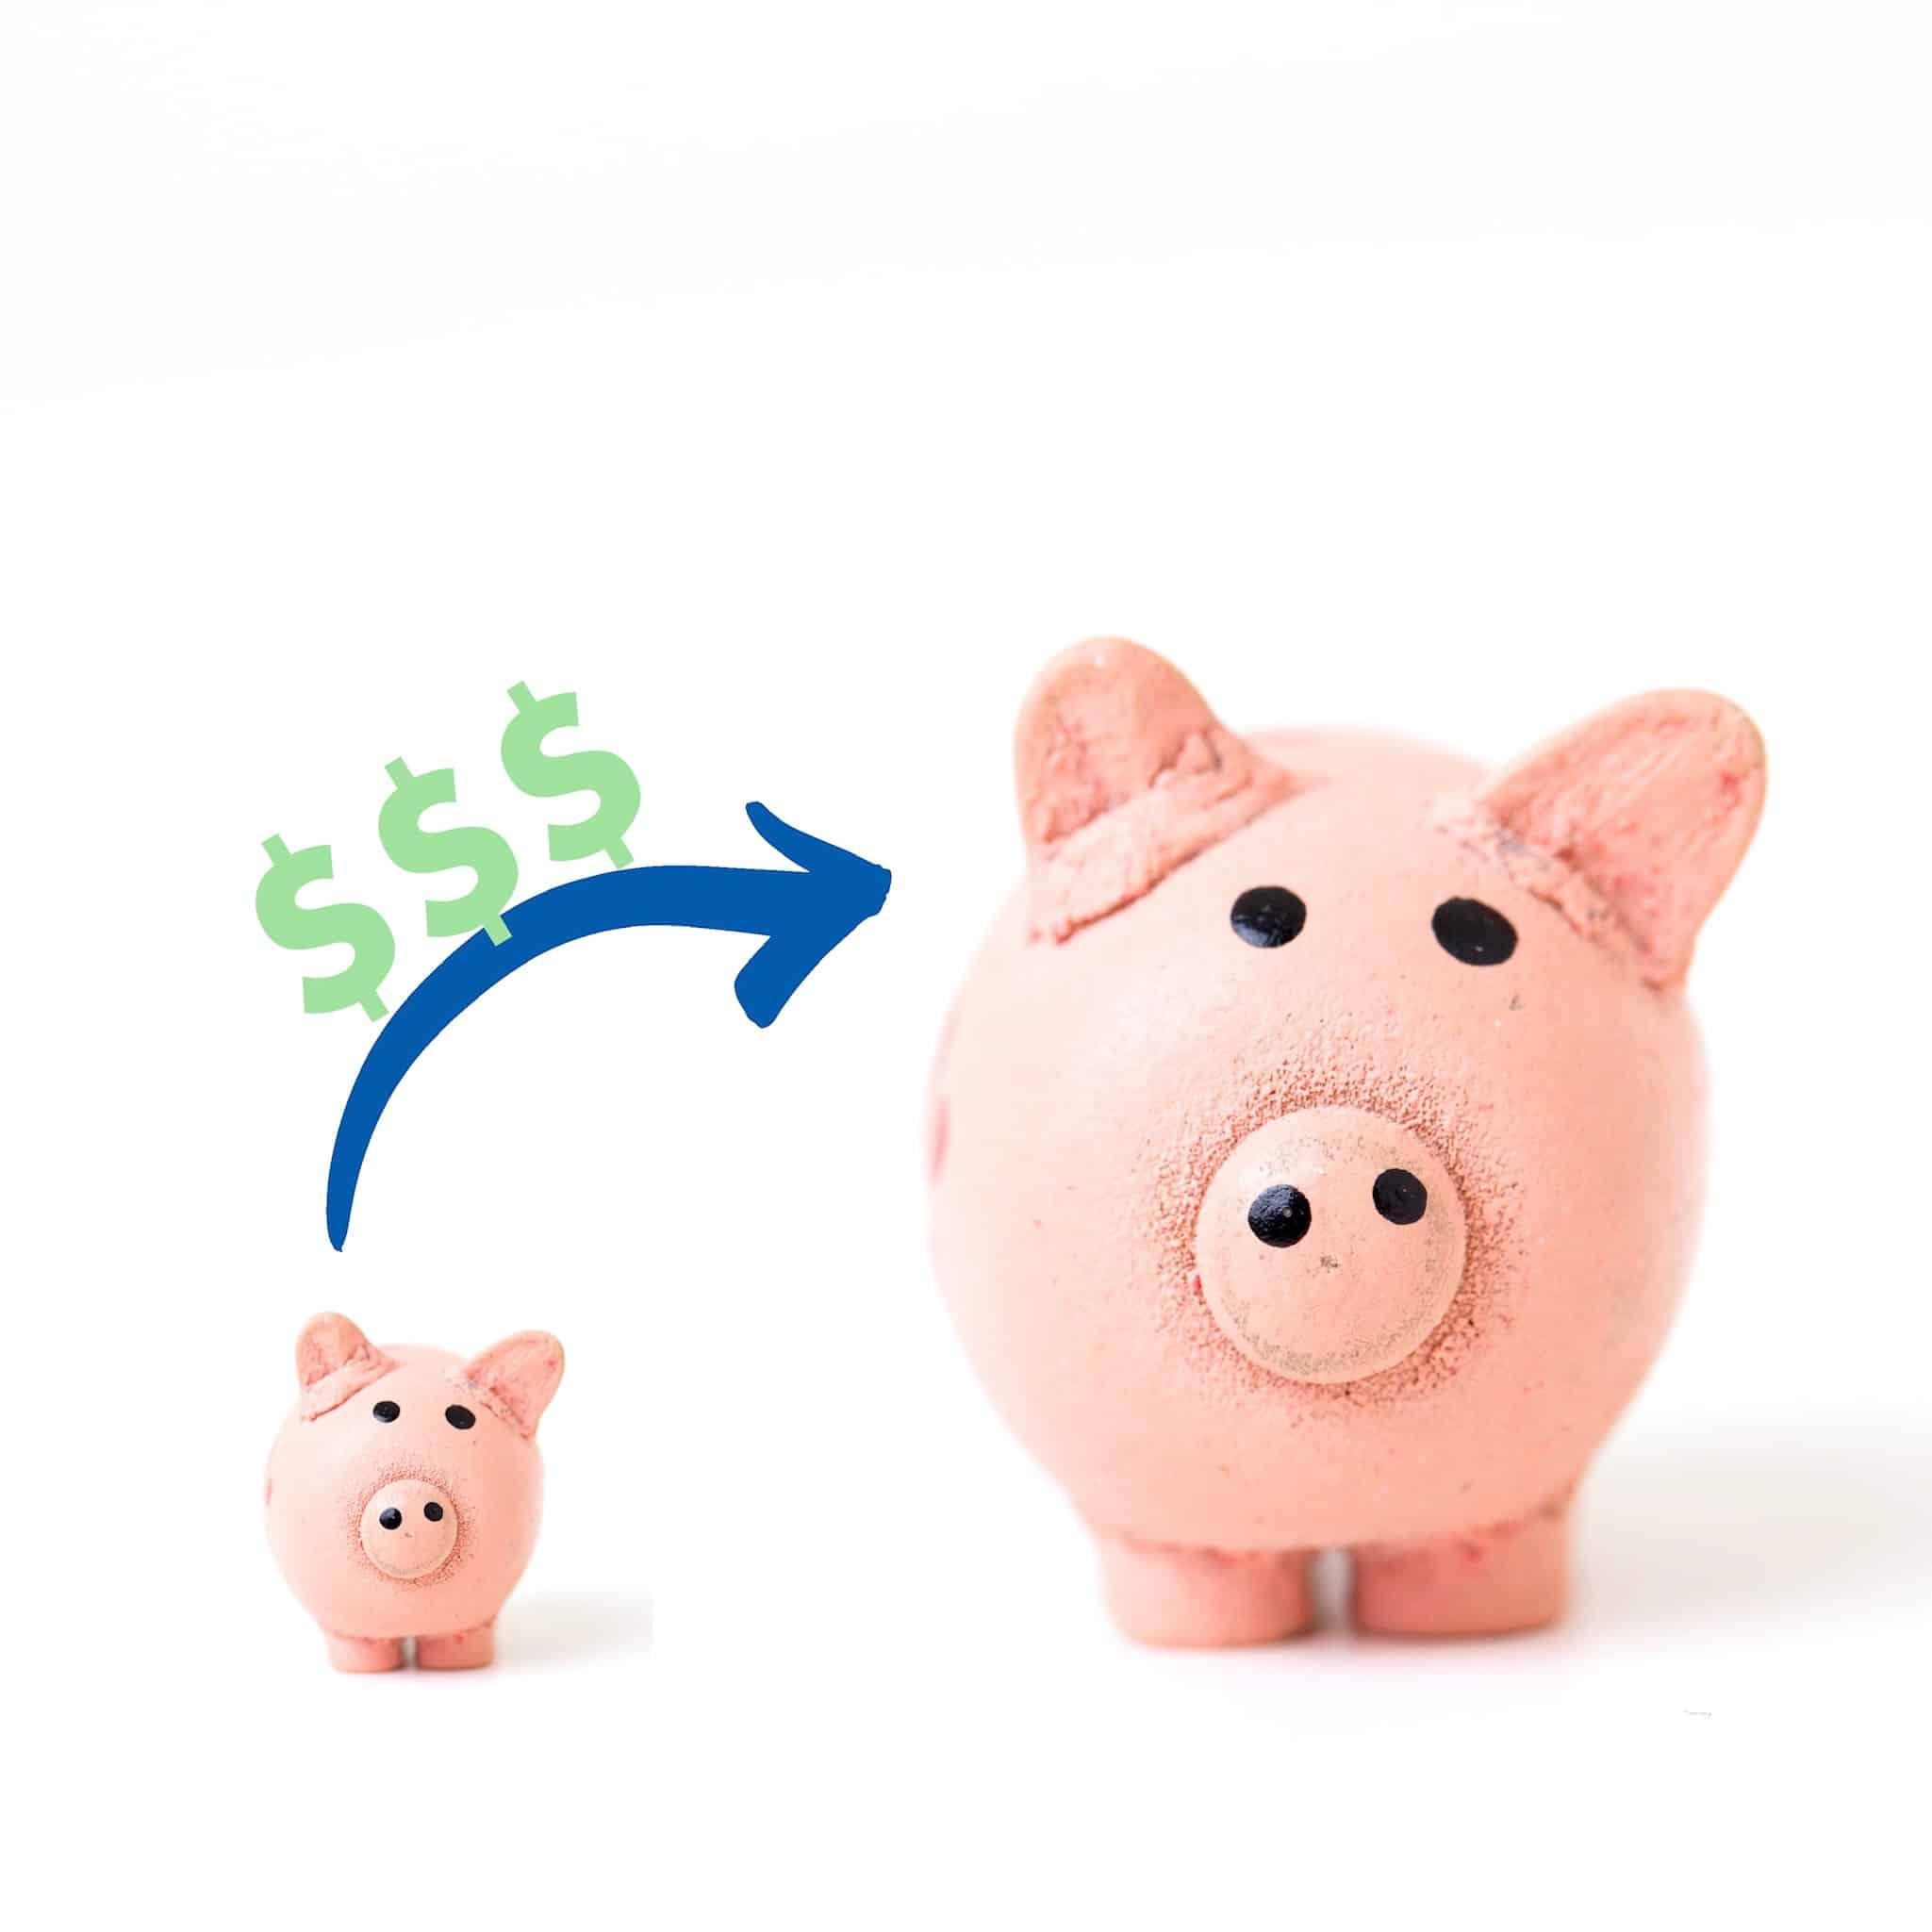 Saving money running your vacation rental